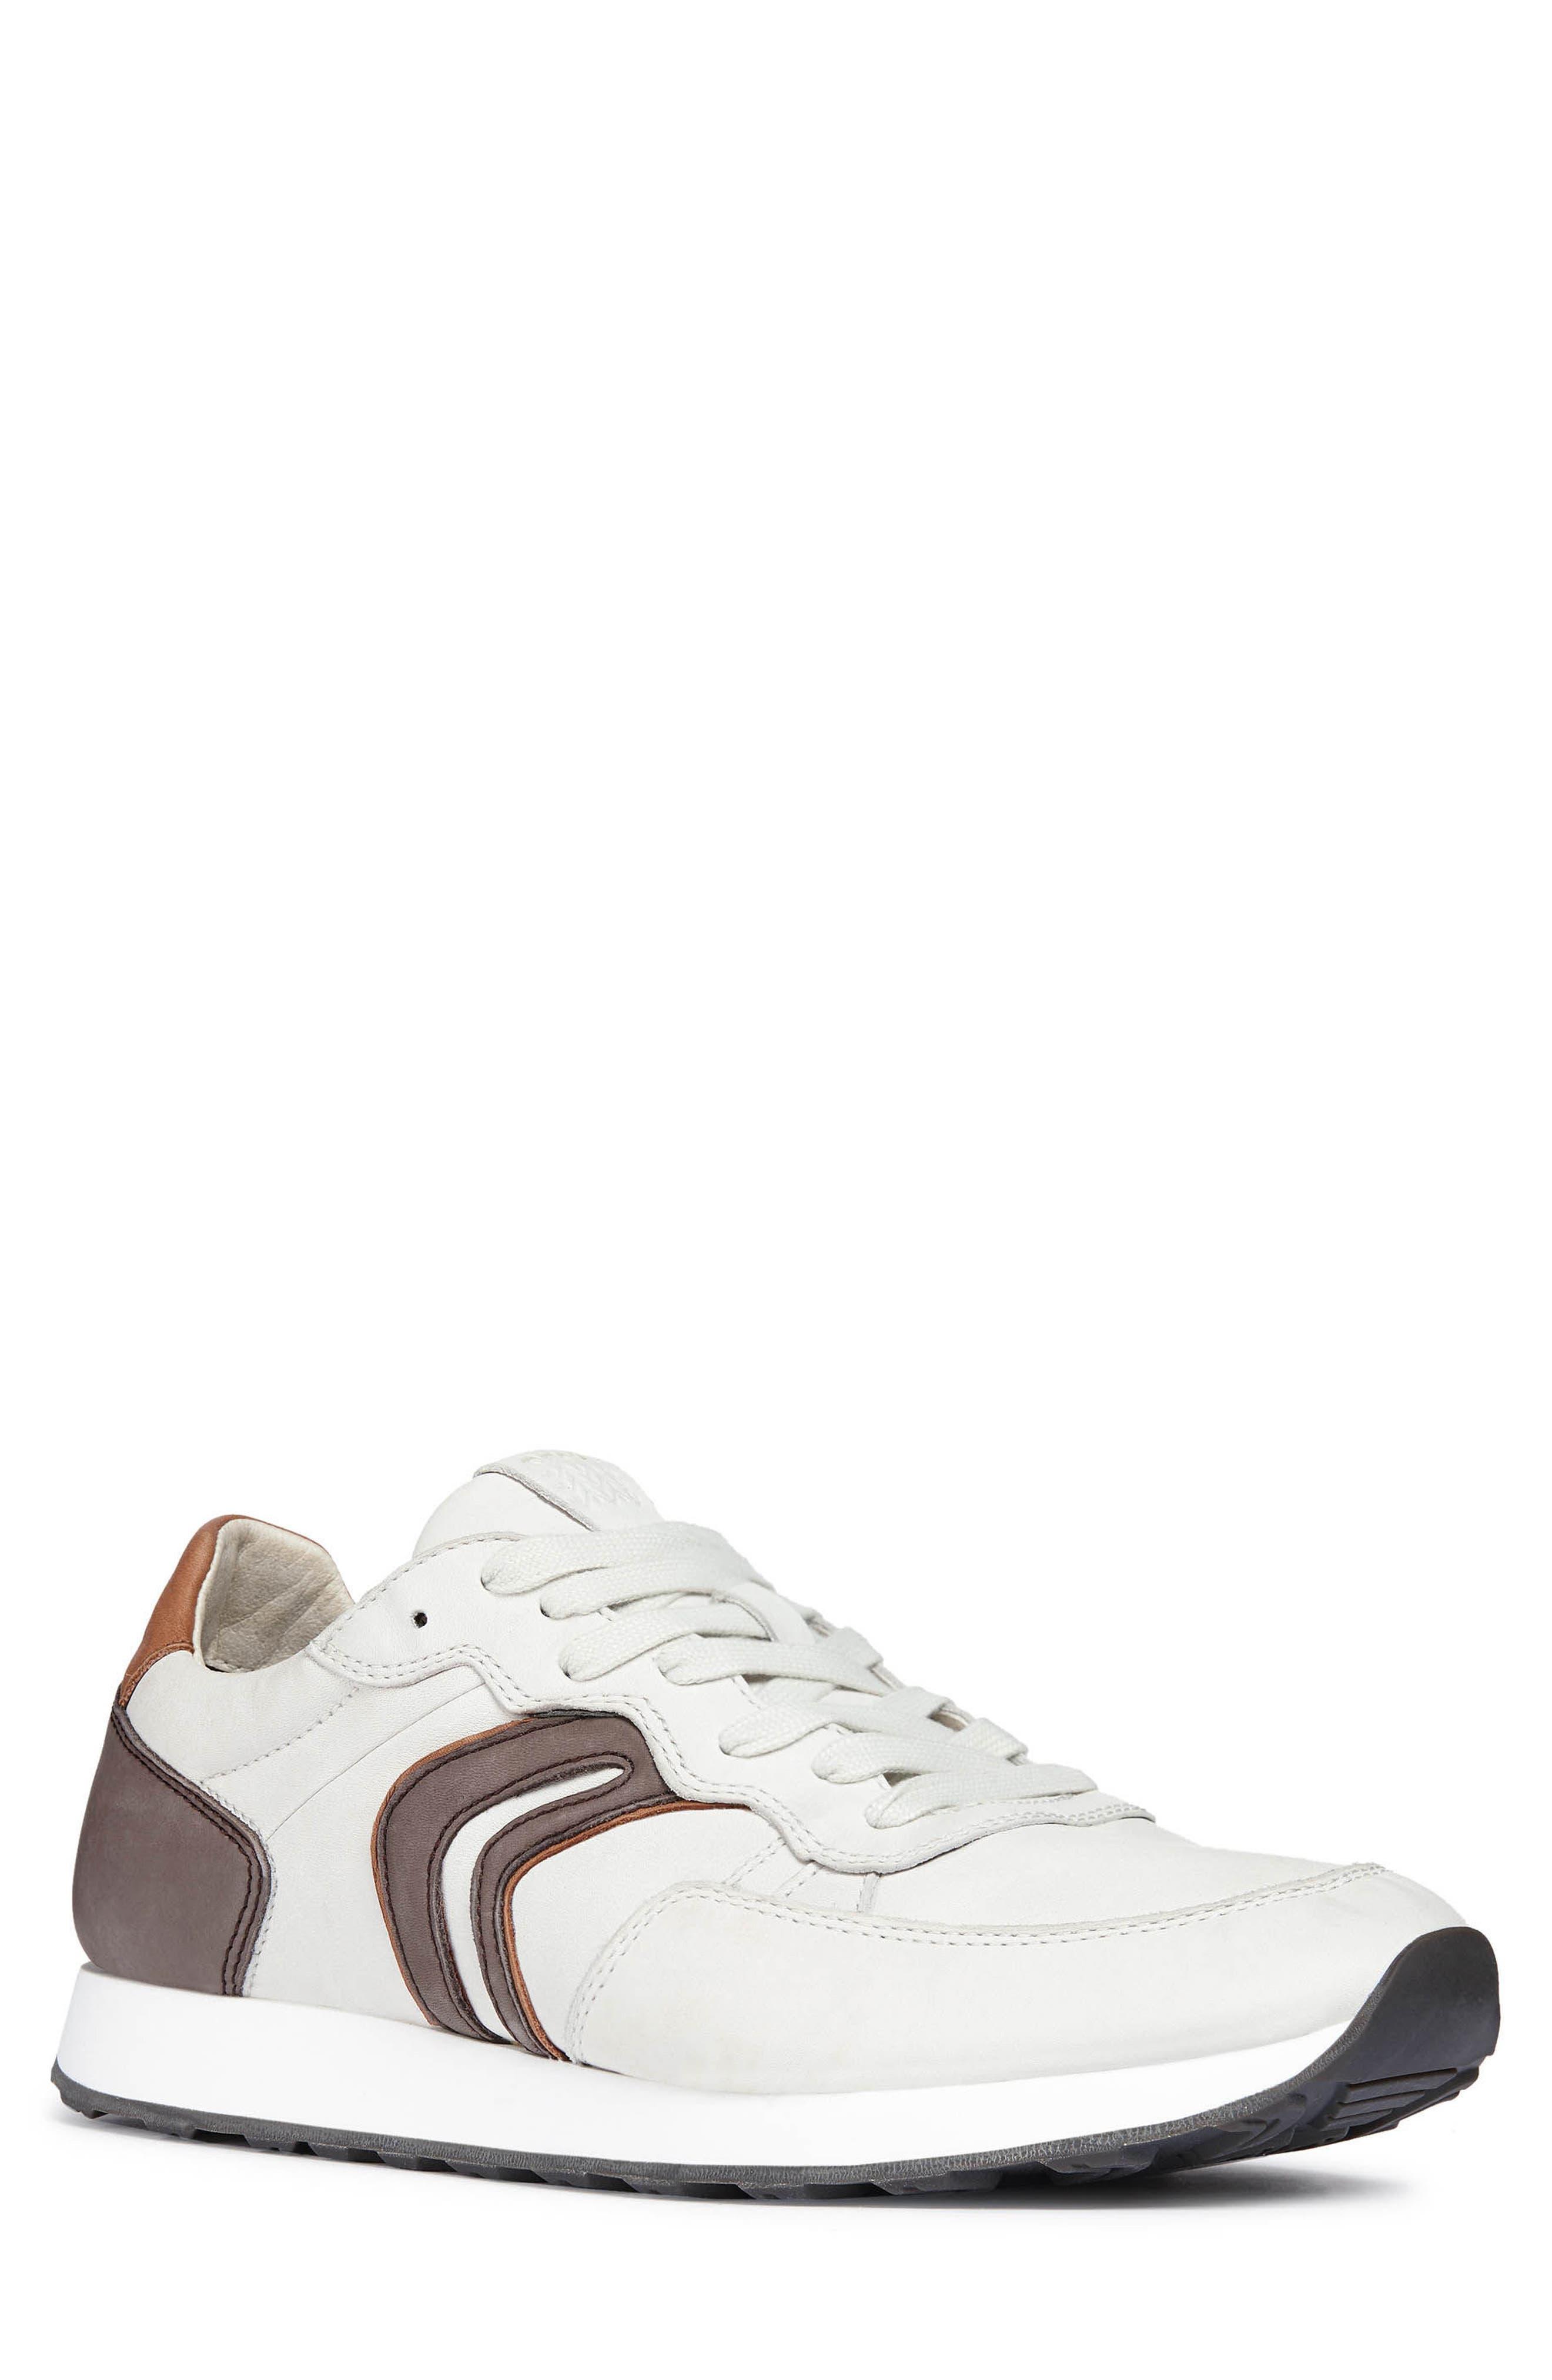 Vincint 1 Sneaker,                         Main,                         color, WHITE/ DARK COFFEE LEATHER